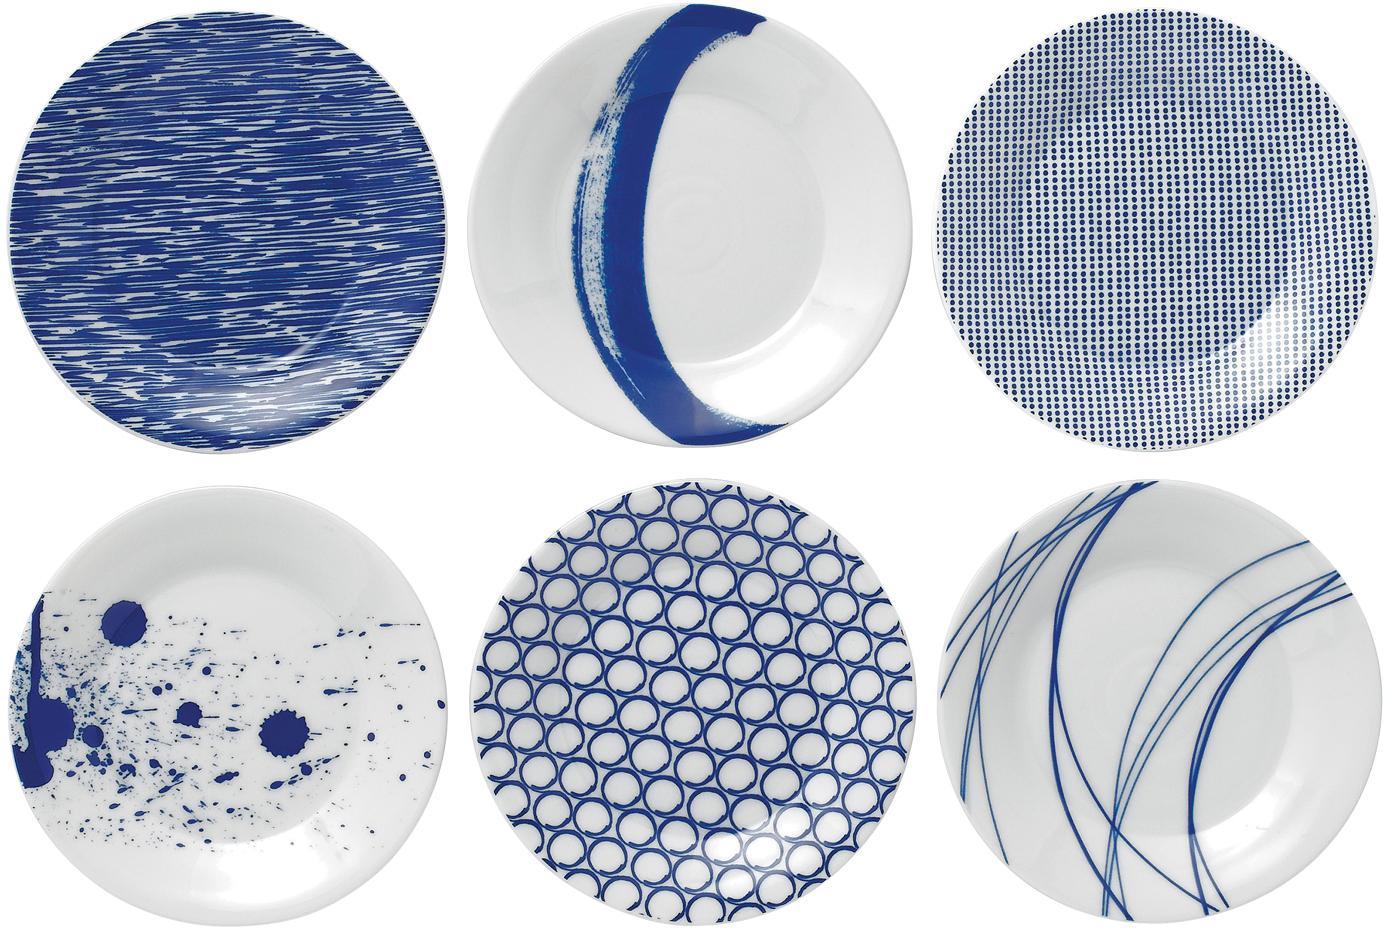 Porseleinen ontbijtbordenset Pacific met patroon, 6-delig, Porselein, Wit, blauw, Ø 16 cm